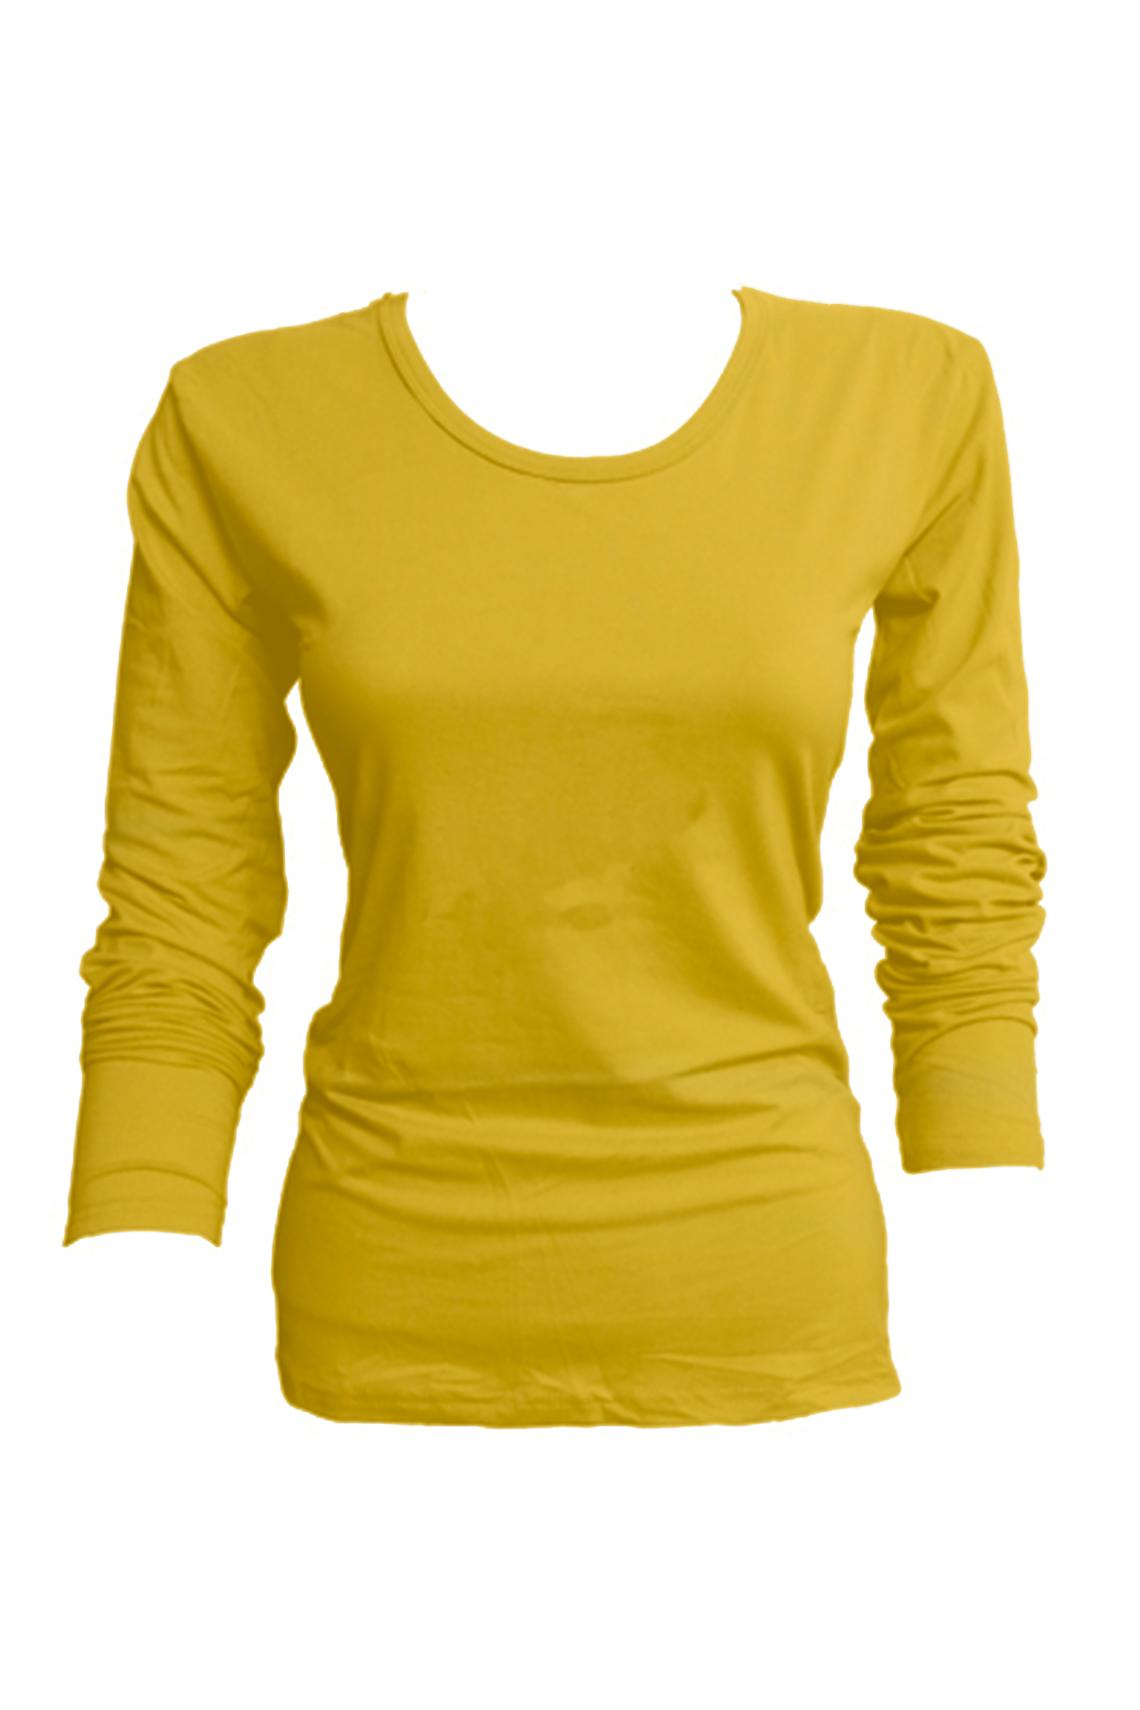 Camiseta bambú M/L amarillo mostaza L - XXL